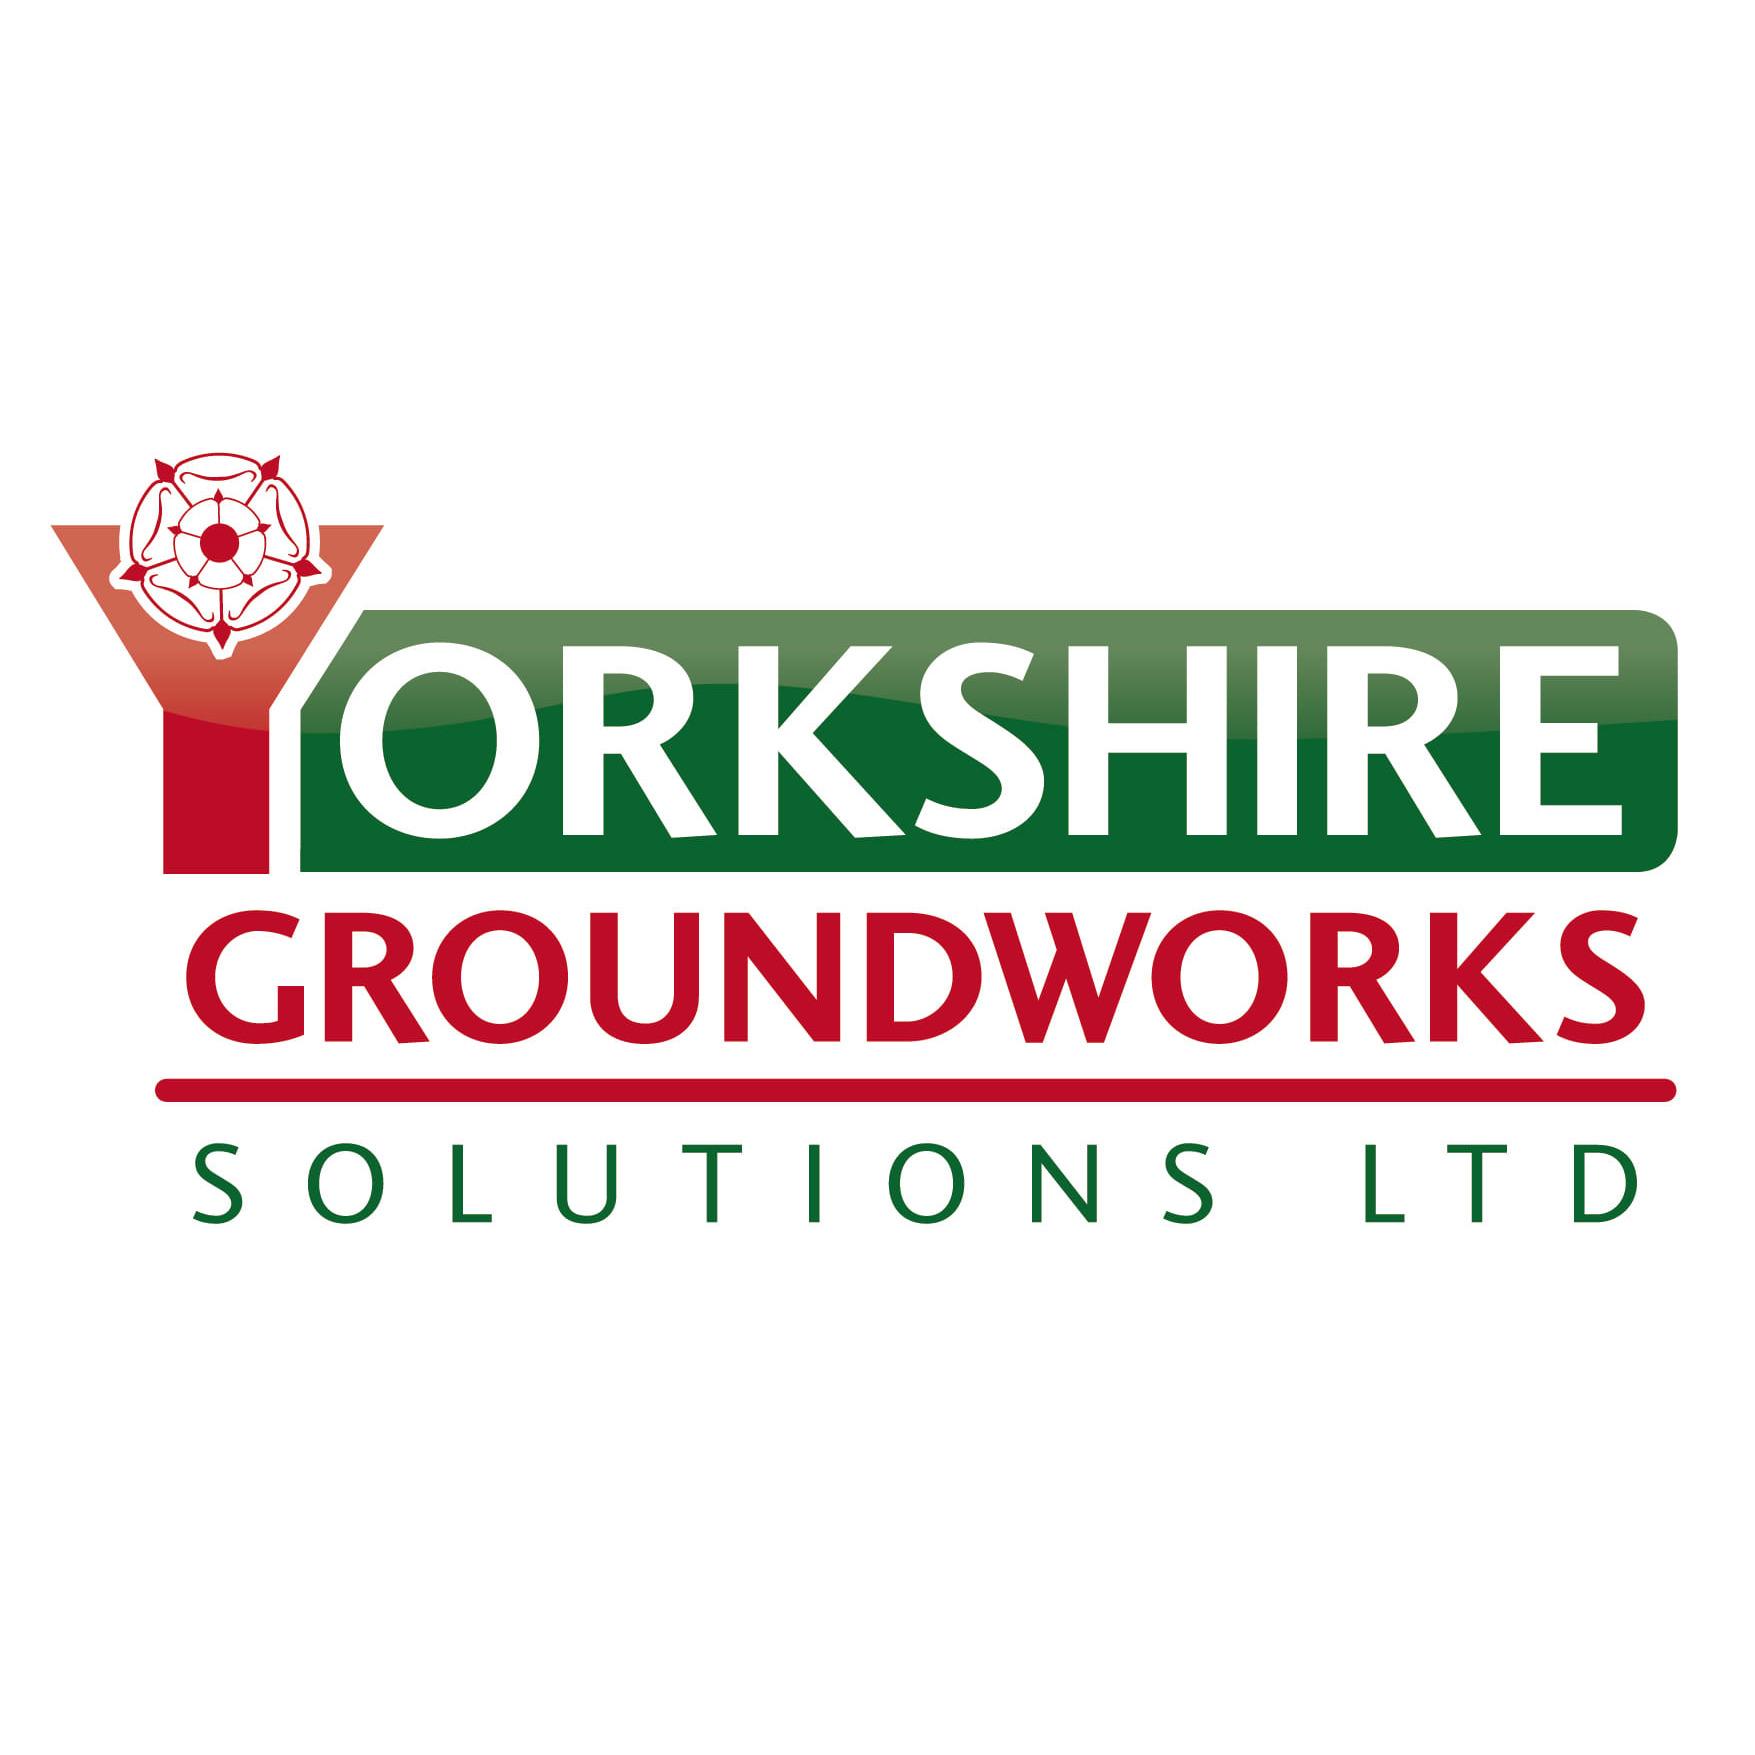 Yorkshire Groundworks Solutions Ltd - Hull, North Yorkshire HU7 0YQ - 01482 829979 | ShowMeLocal.com